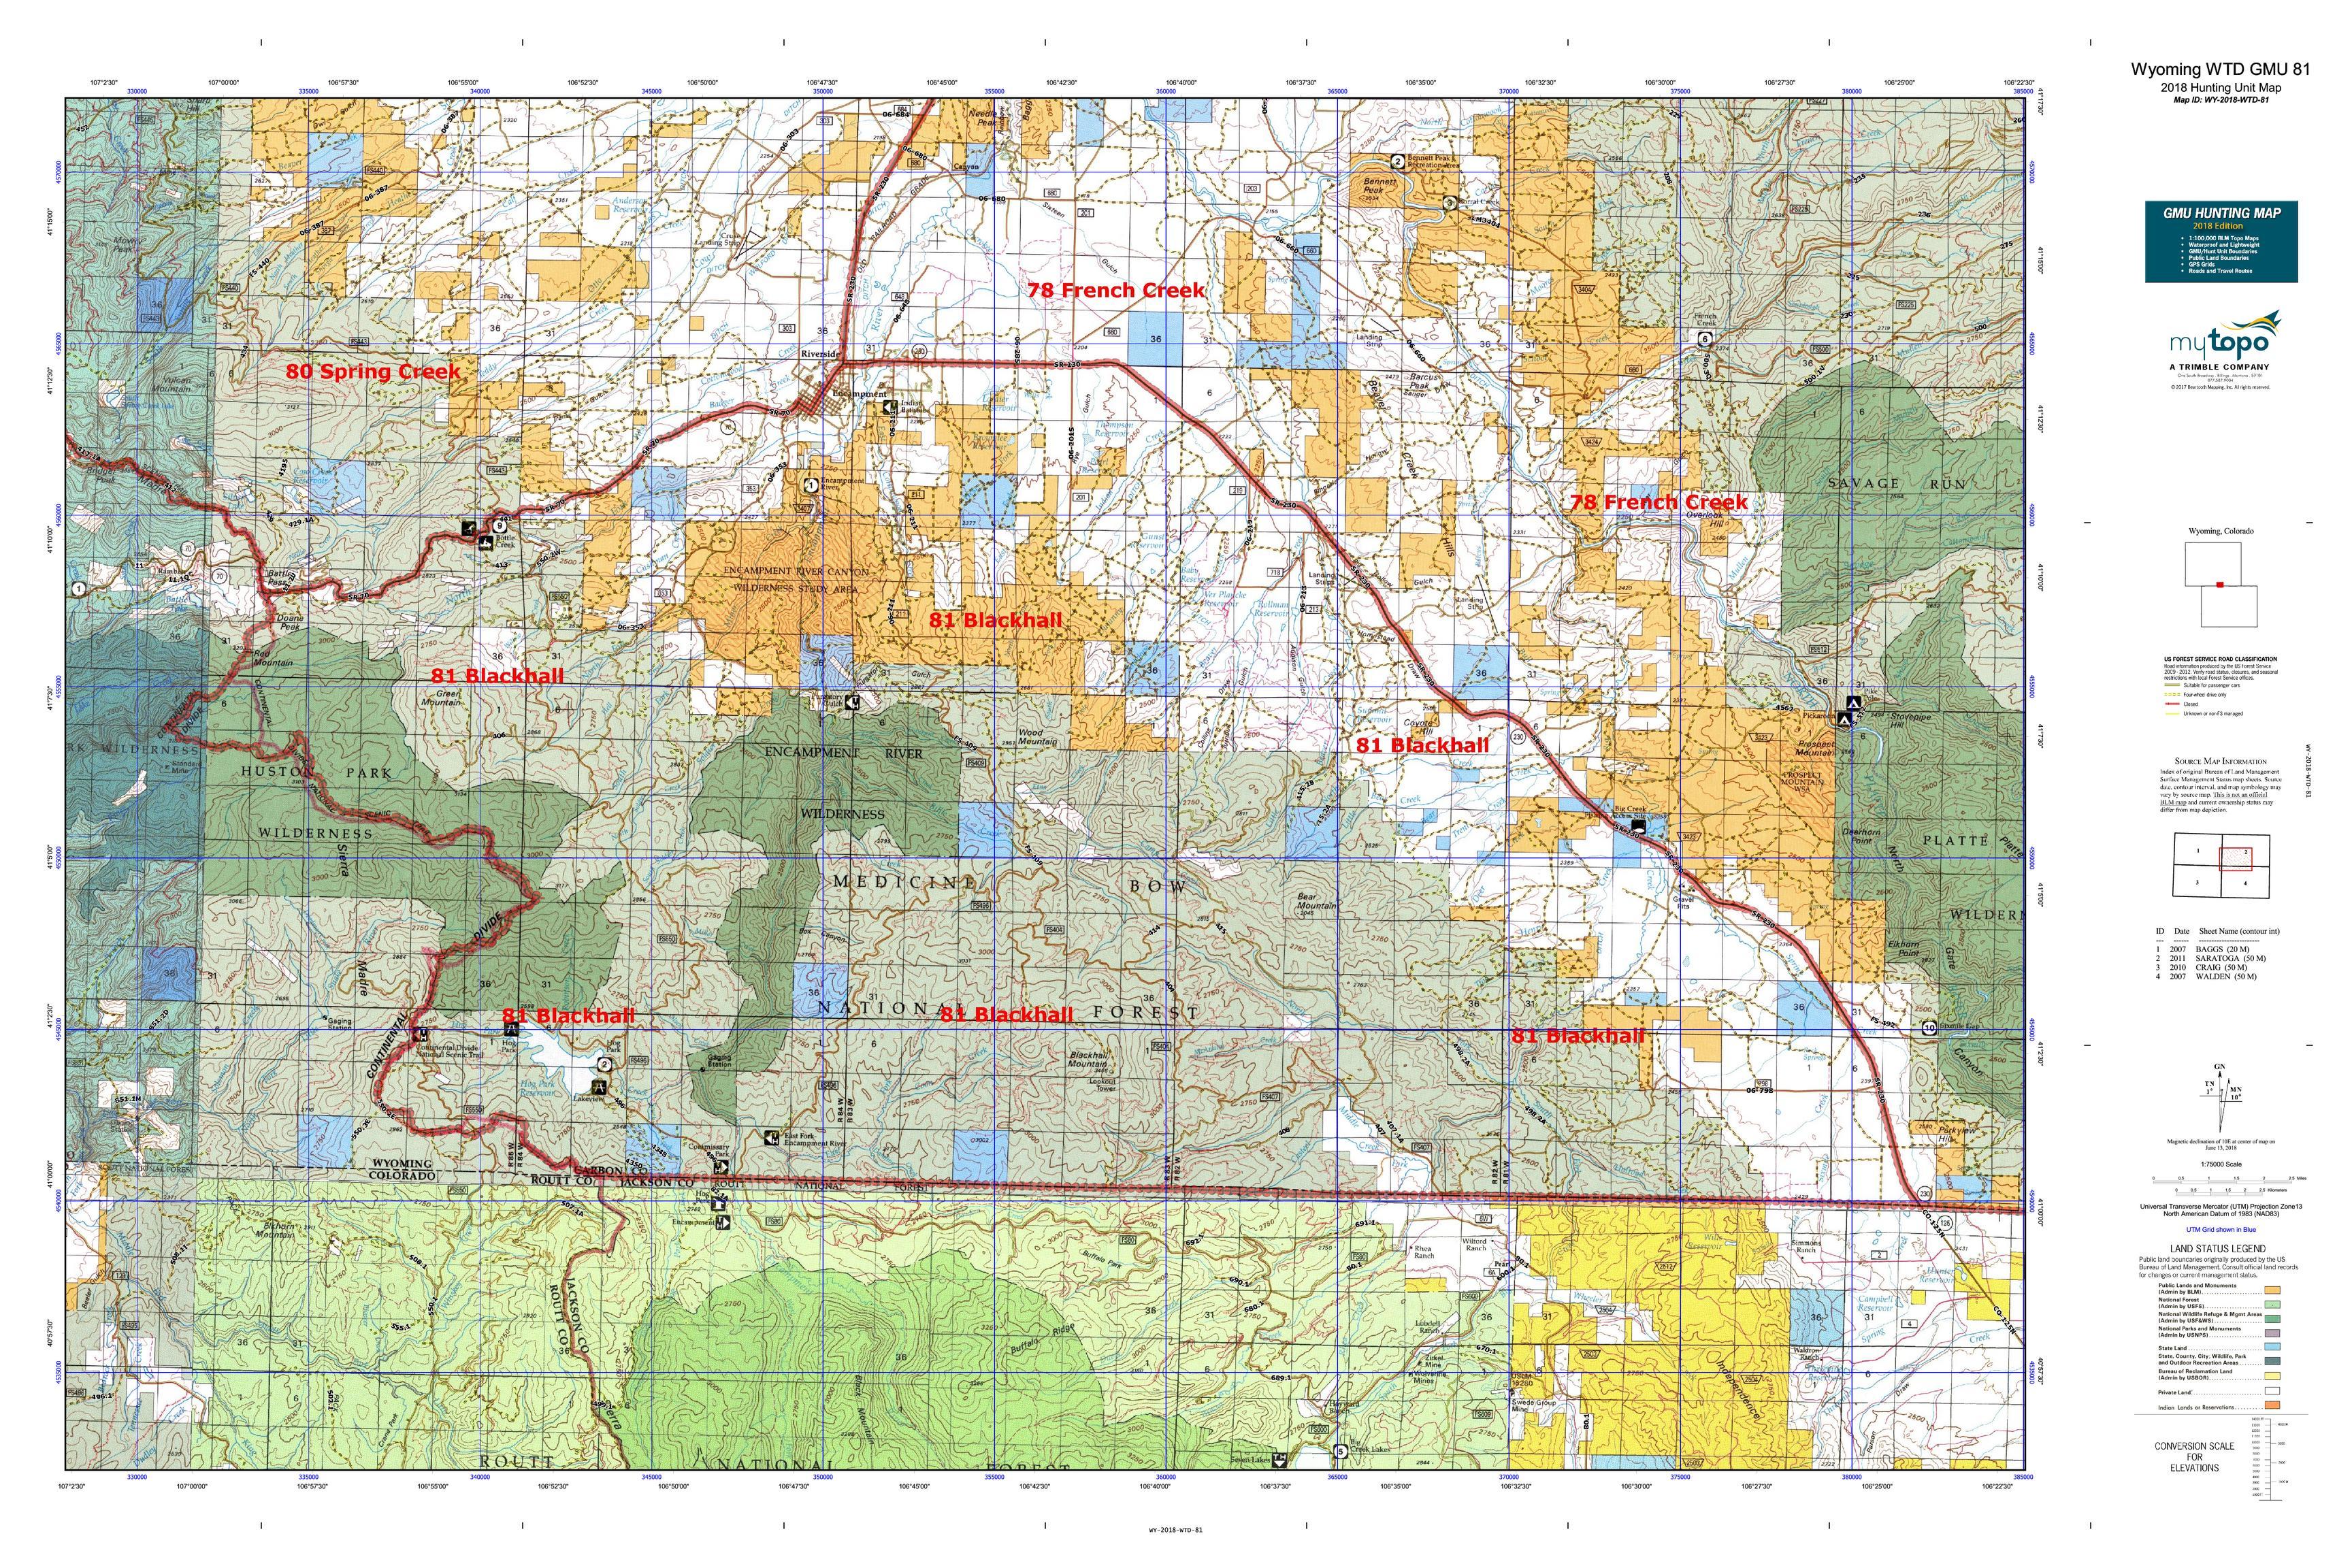 Wyoming WTD GMU 81 Map | MyTopo